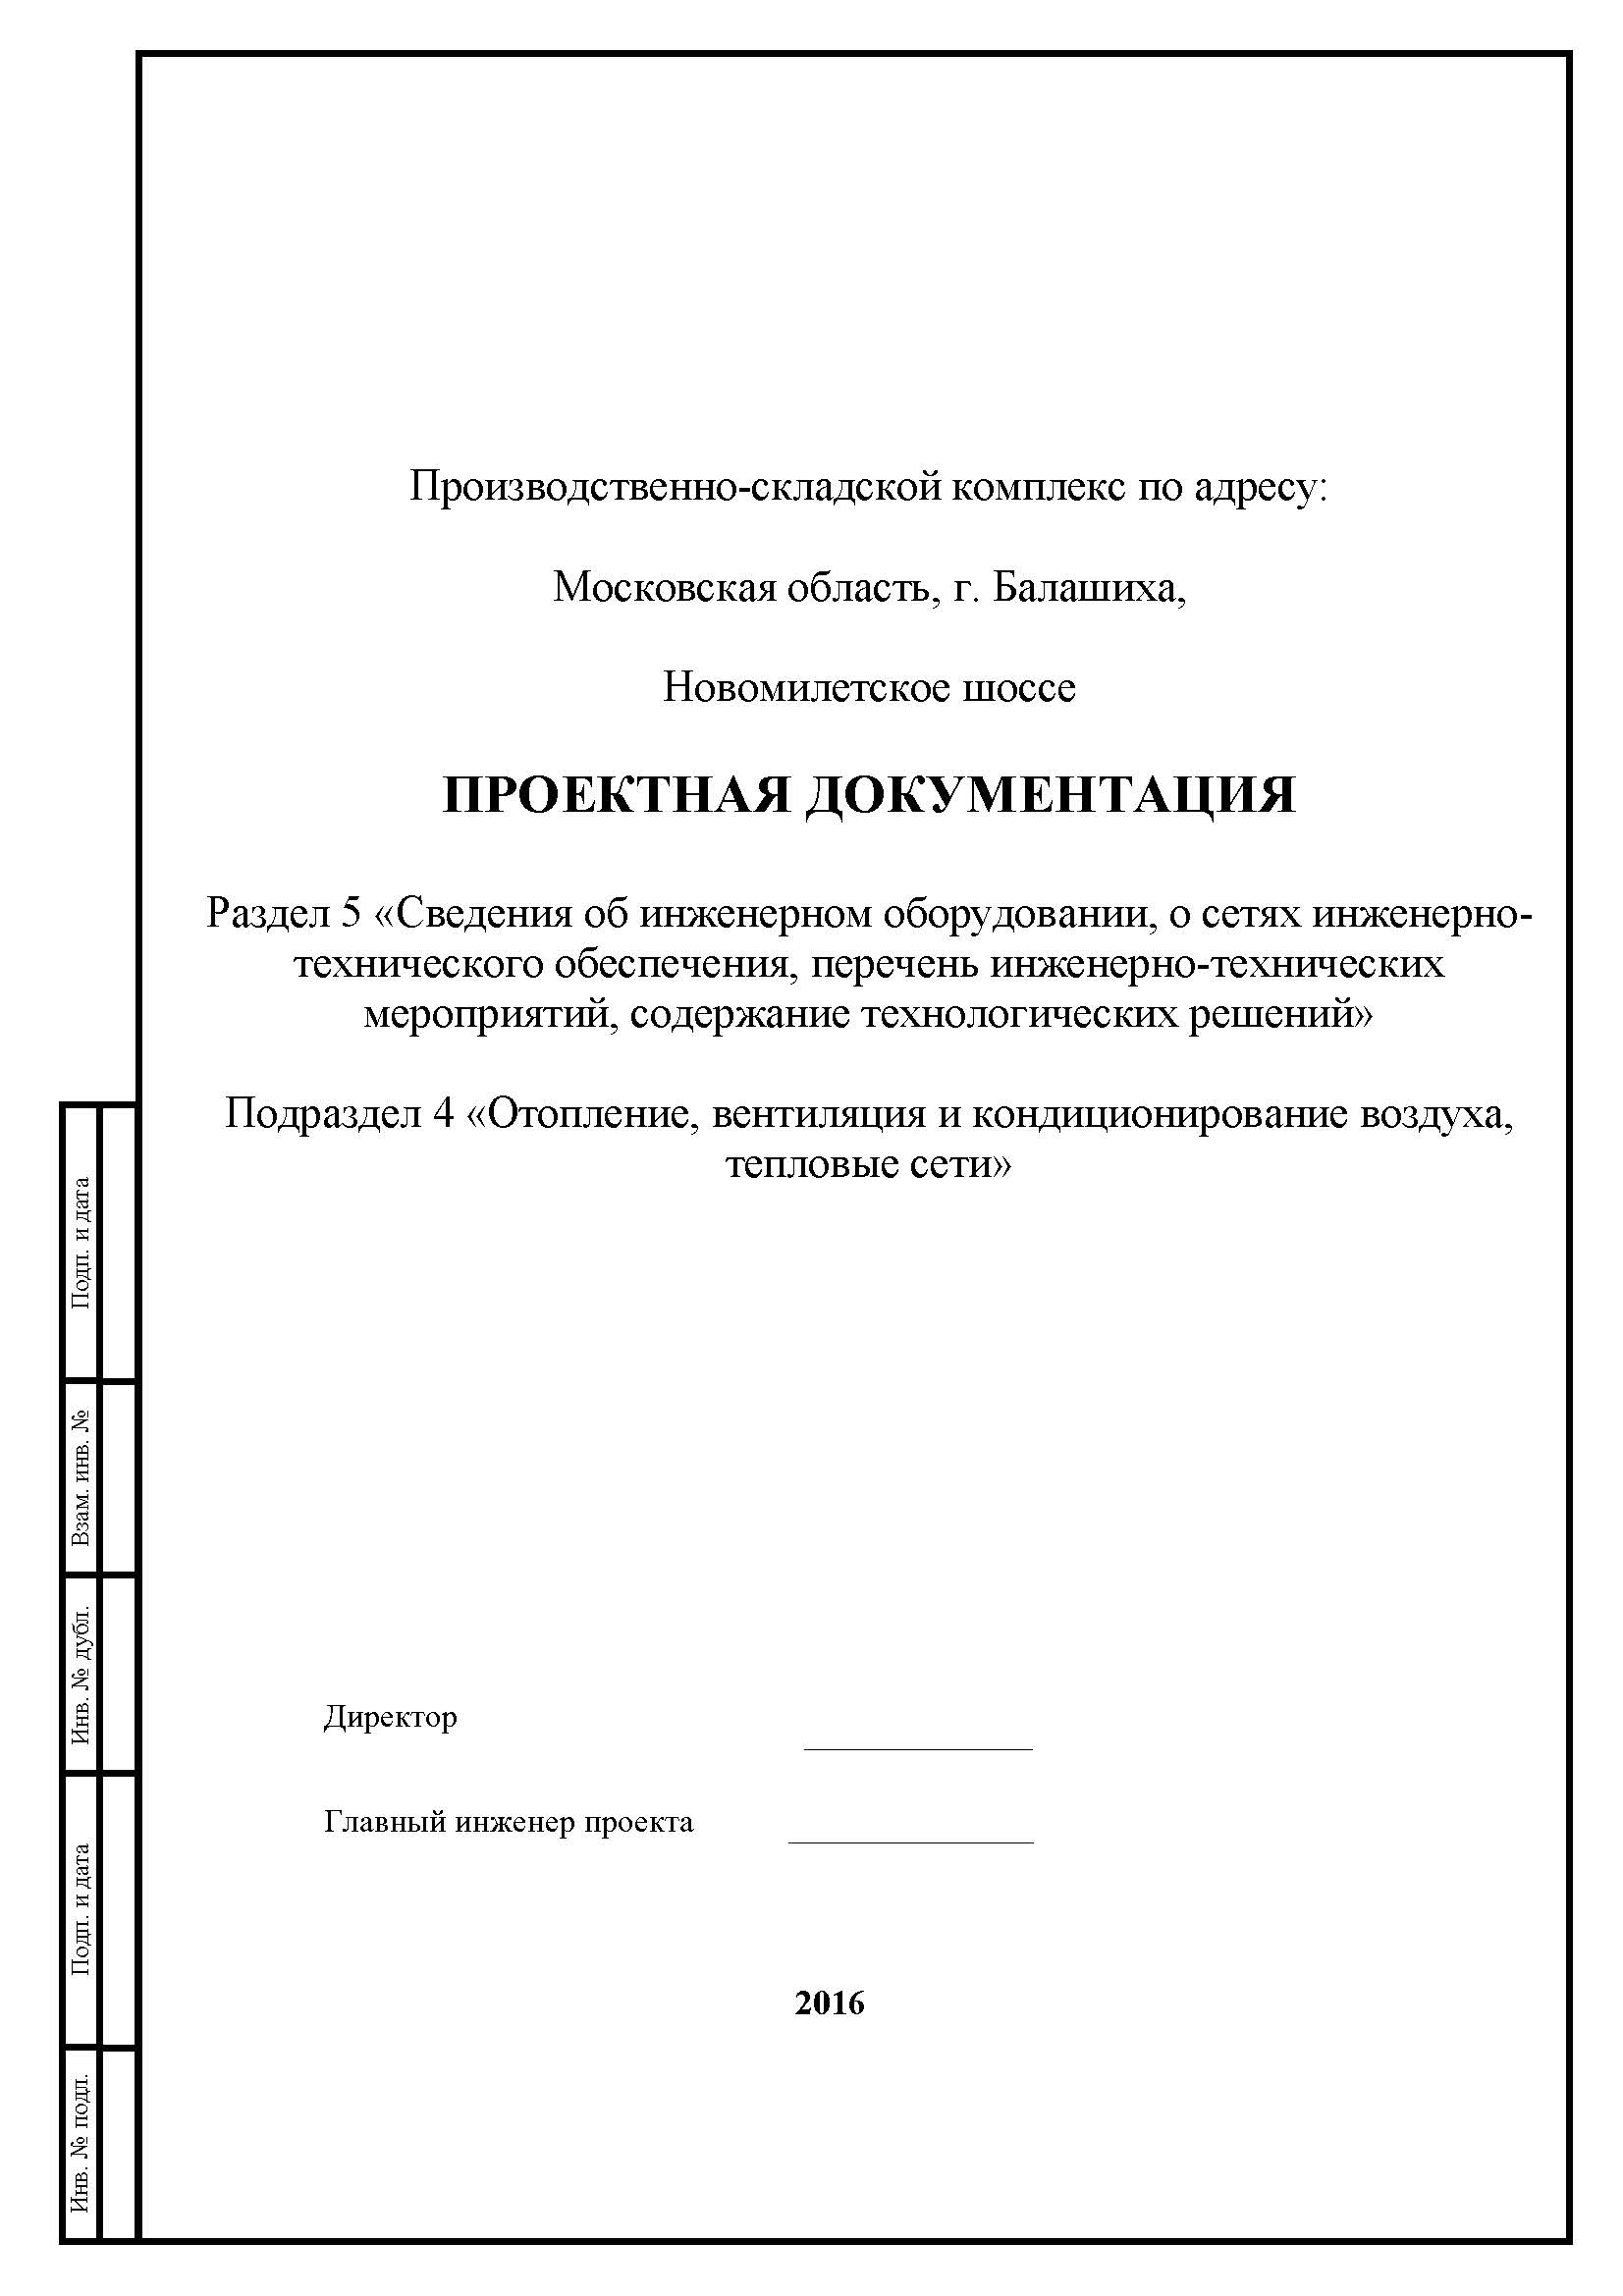 ПСКУниверсалП_Страница_01